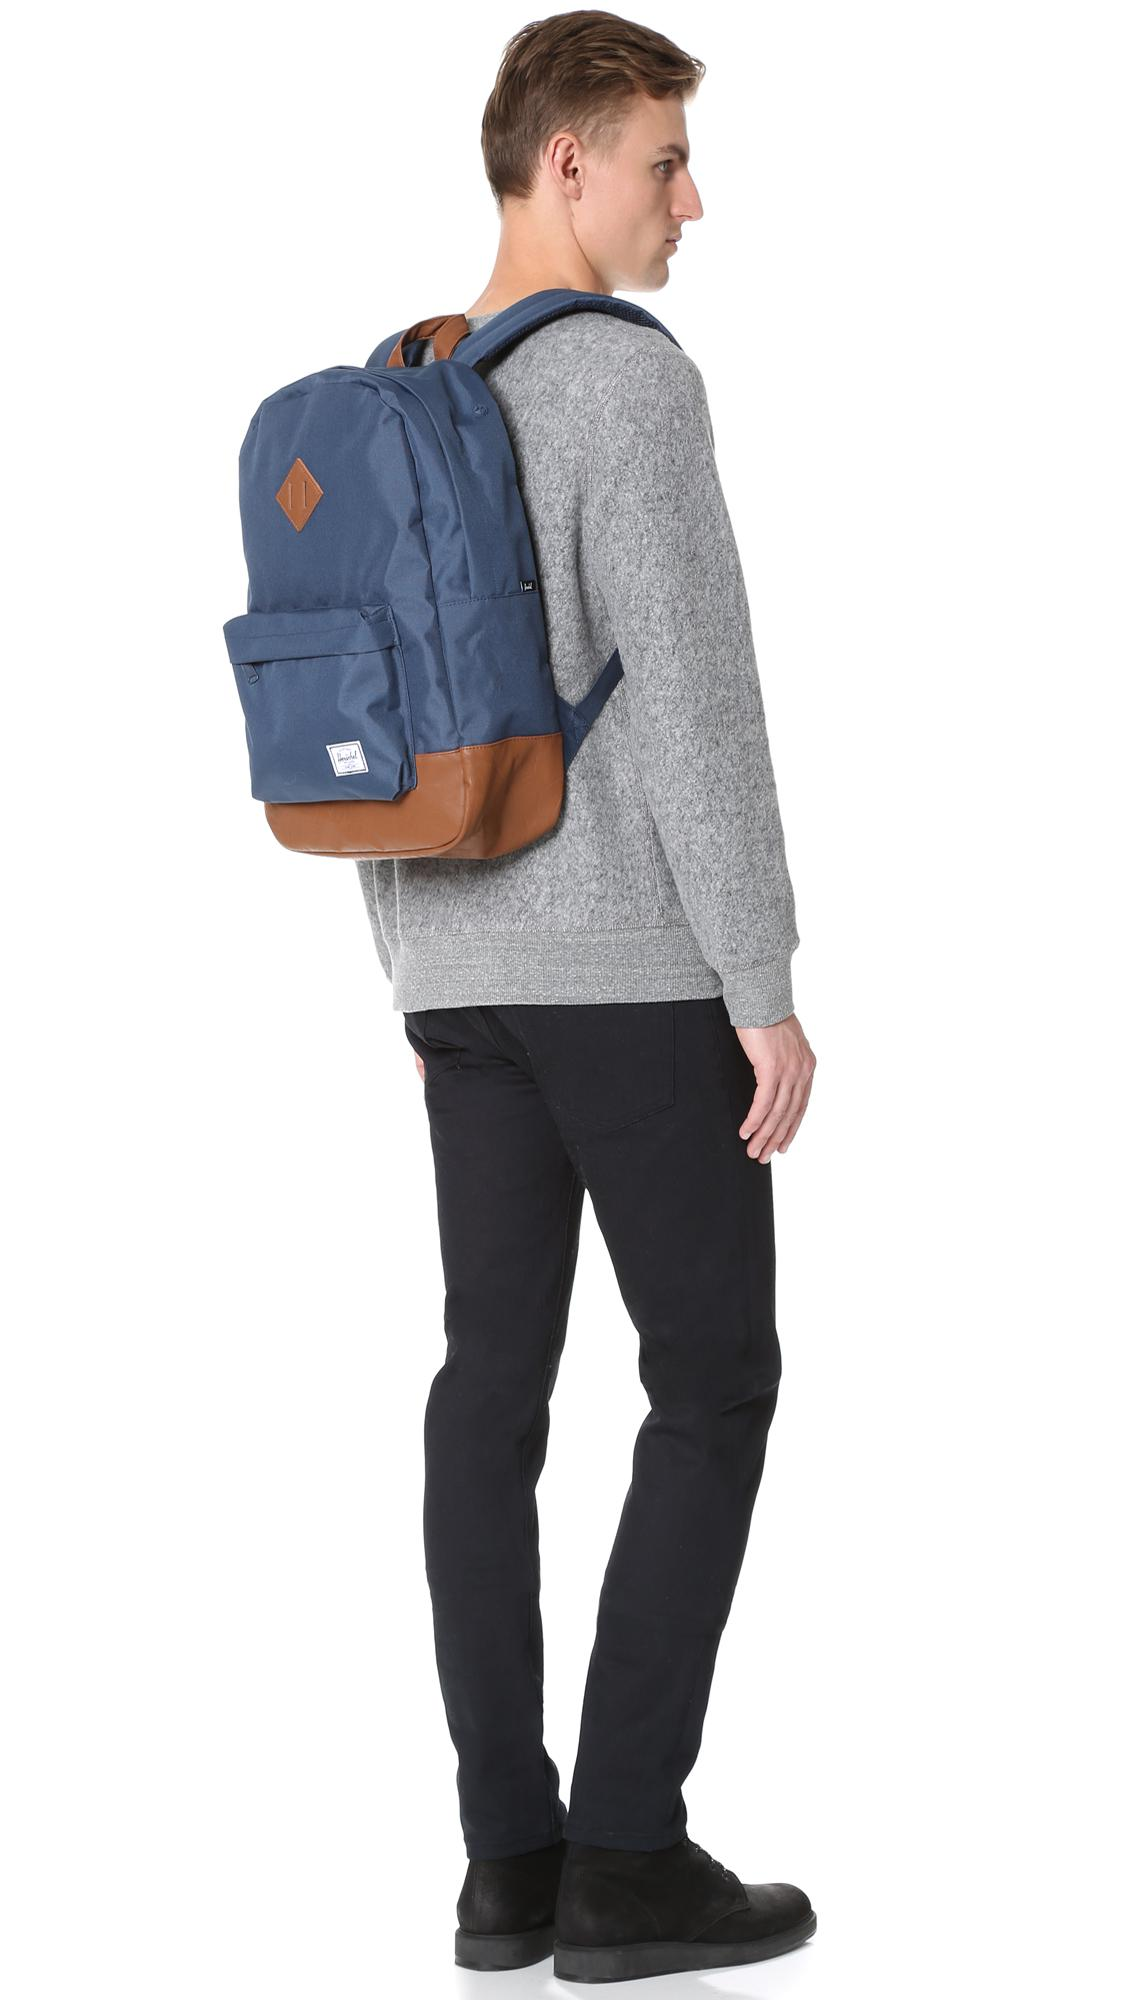 c8d20dc0e2 Herschel Supply Co. - Blue Heritage Classic Backpack for Men - Lyst. View  fullscreen